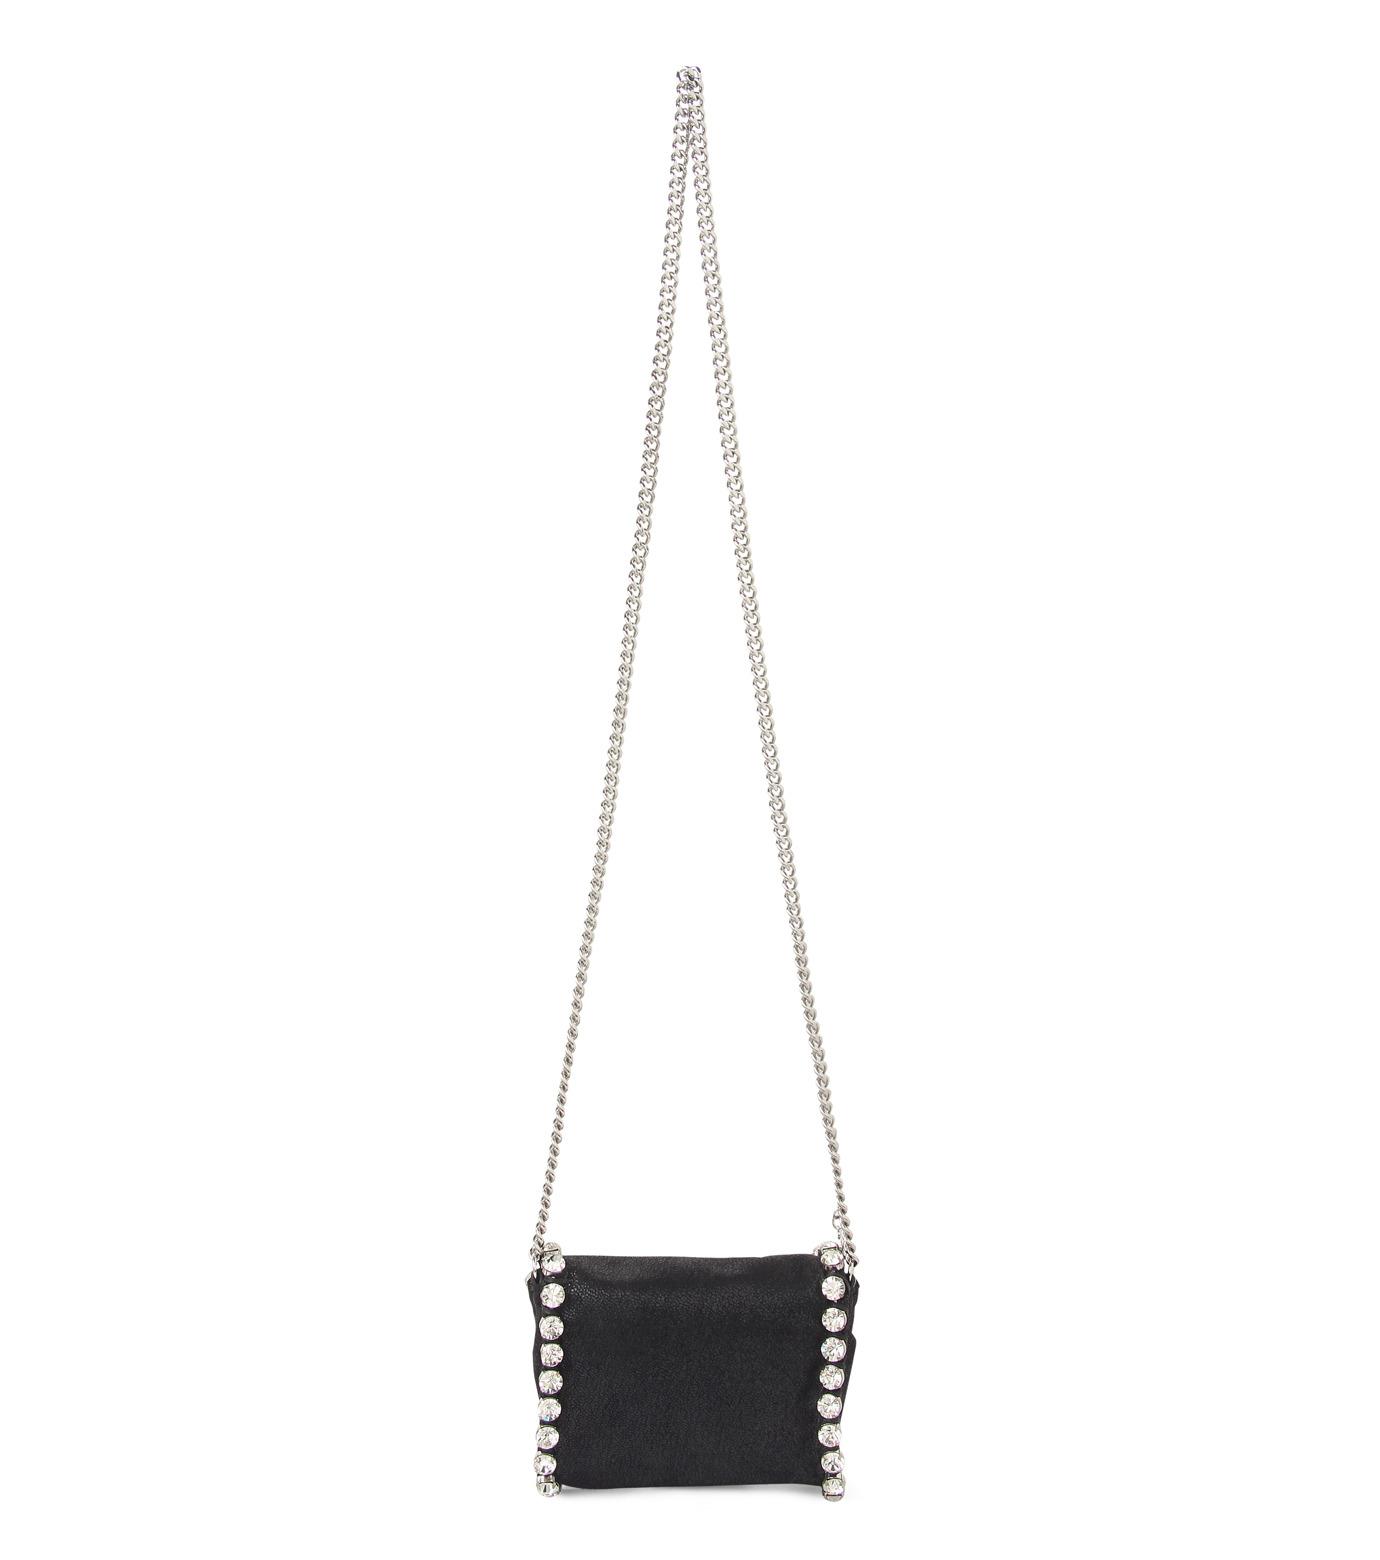 Stella McCartney(ステラマッカートニー)のTiny Fold Over Cross-Body-BLACK(バッグ/ショルダーバッグ/bag/shoulder bag)-391697-W9746-13 拡大詳細画像3